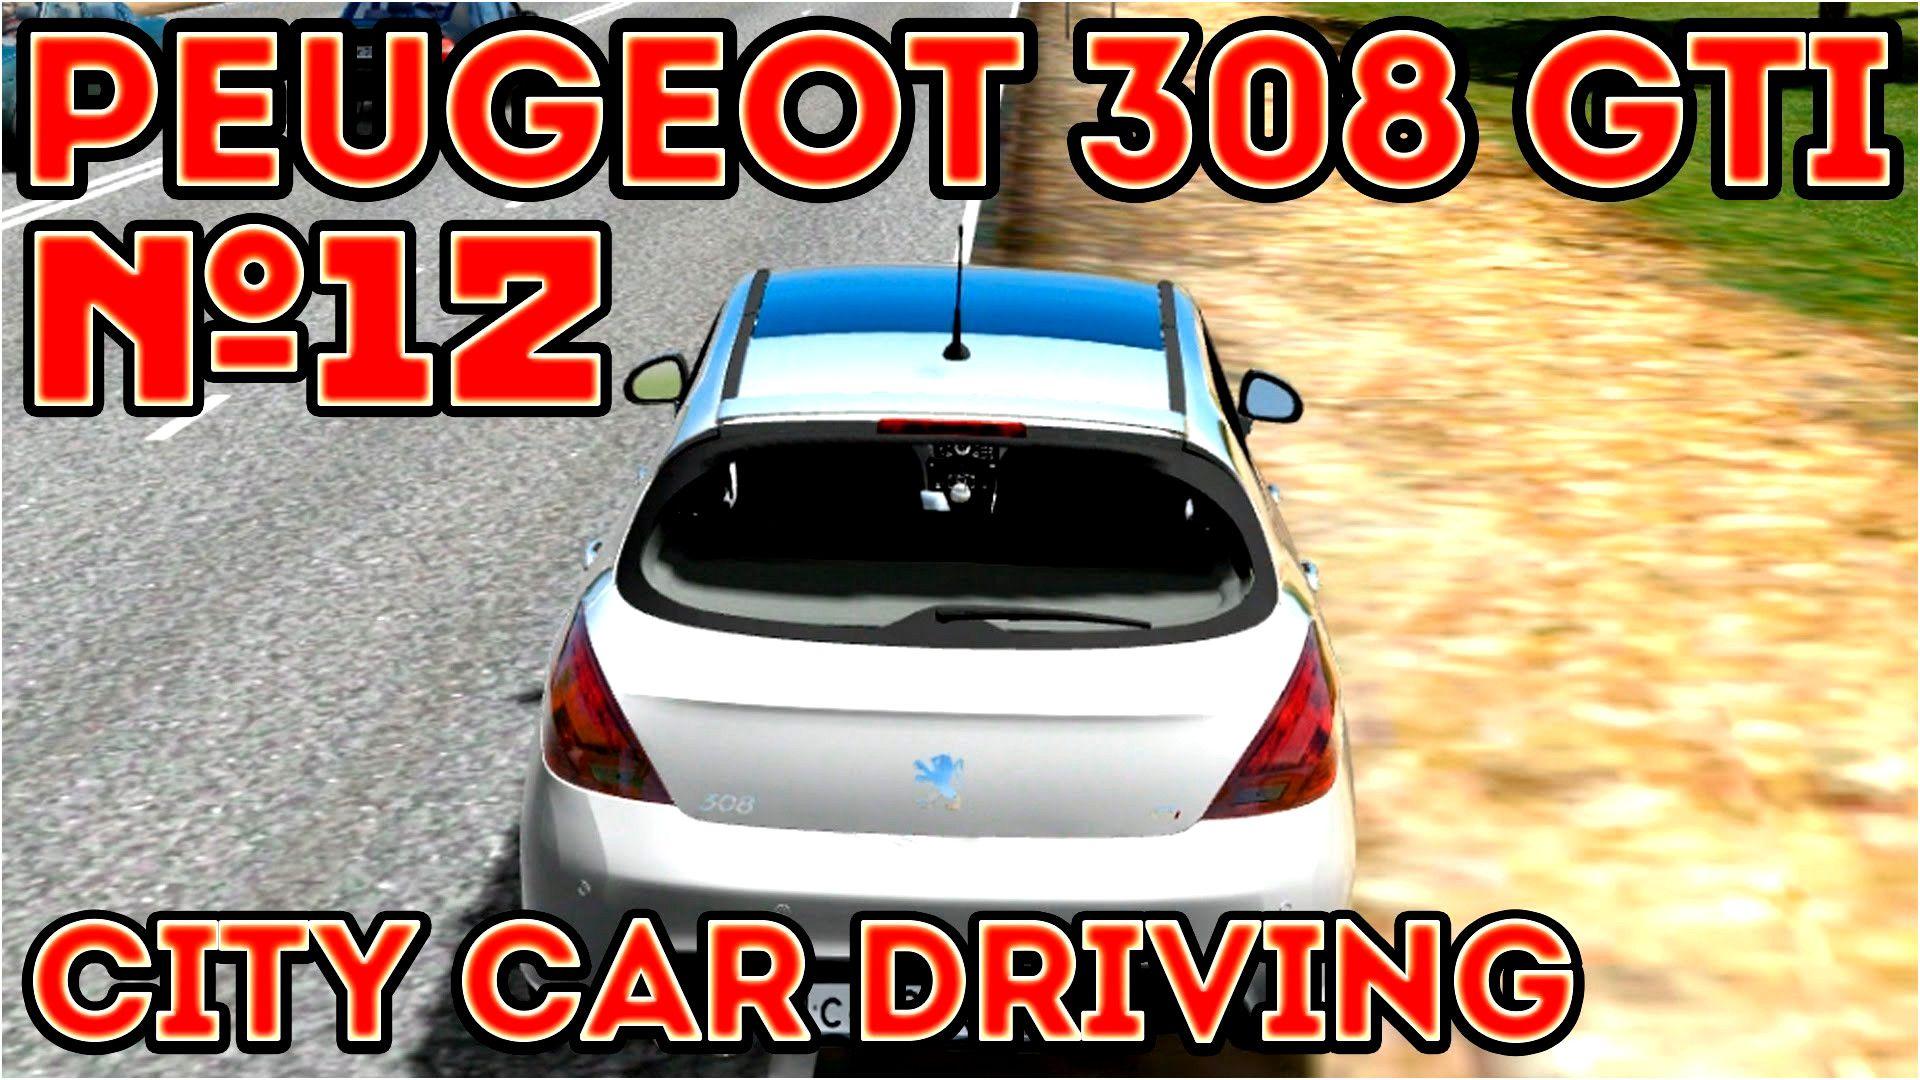 50 https dcs renault com city car